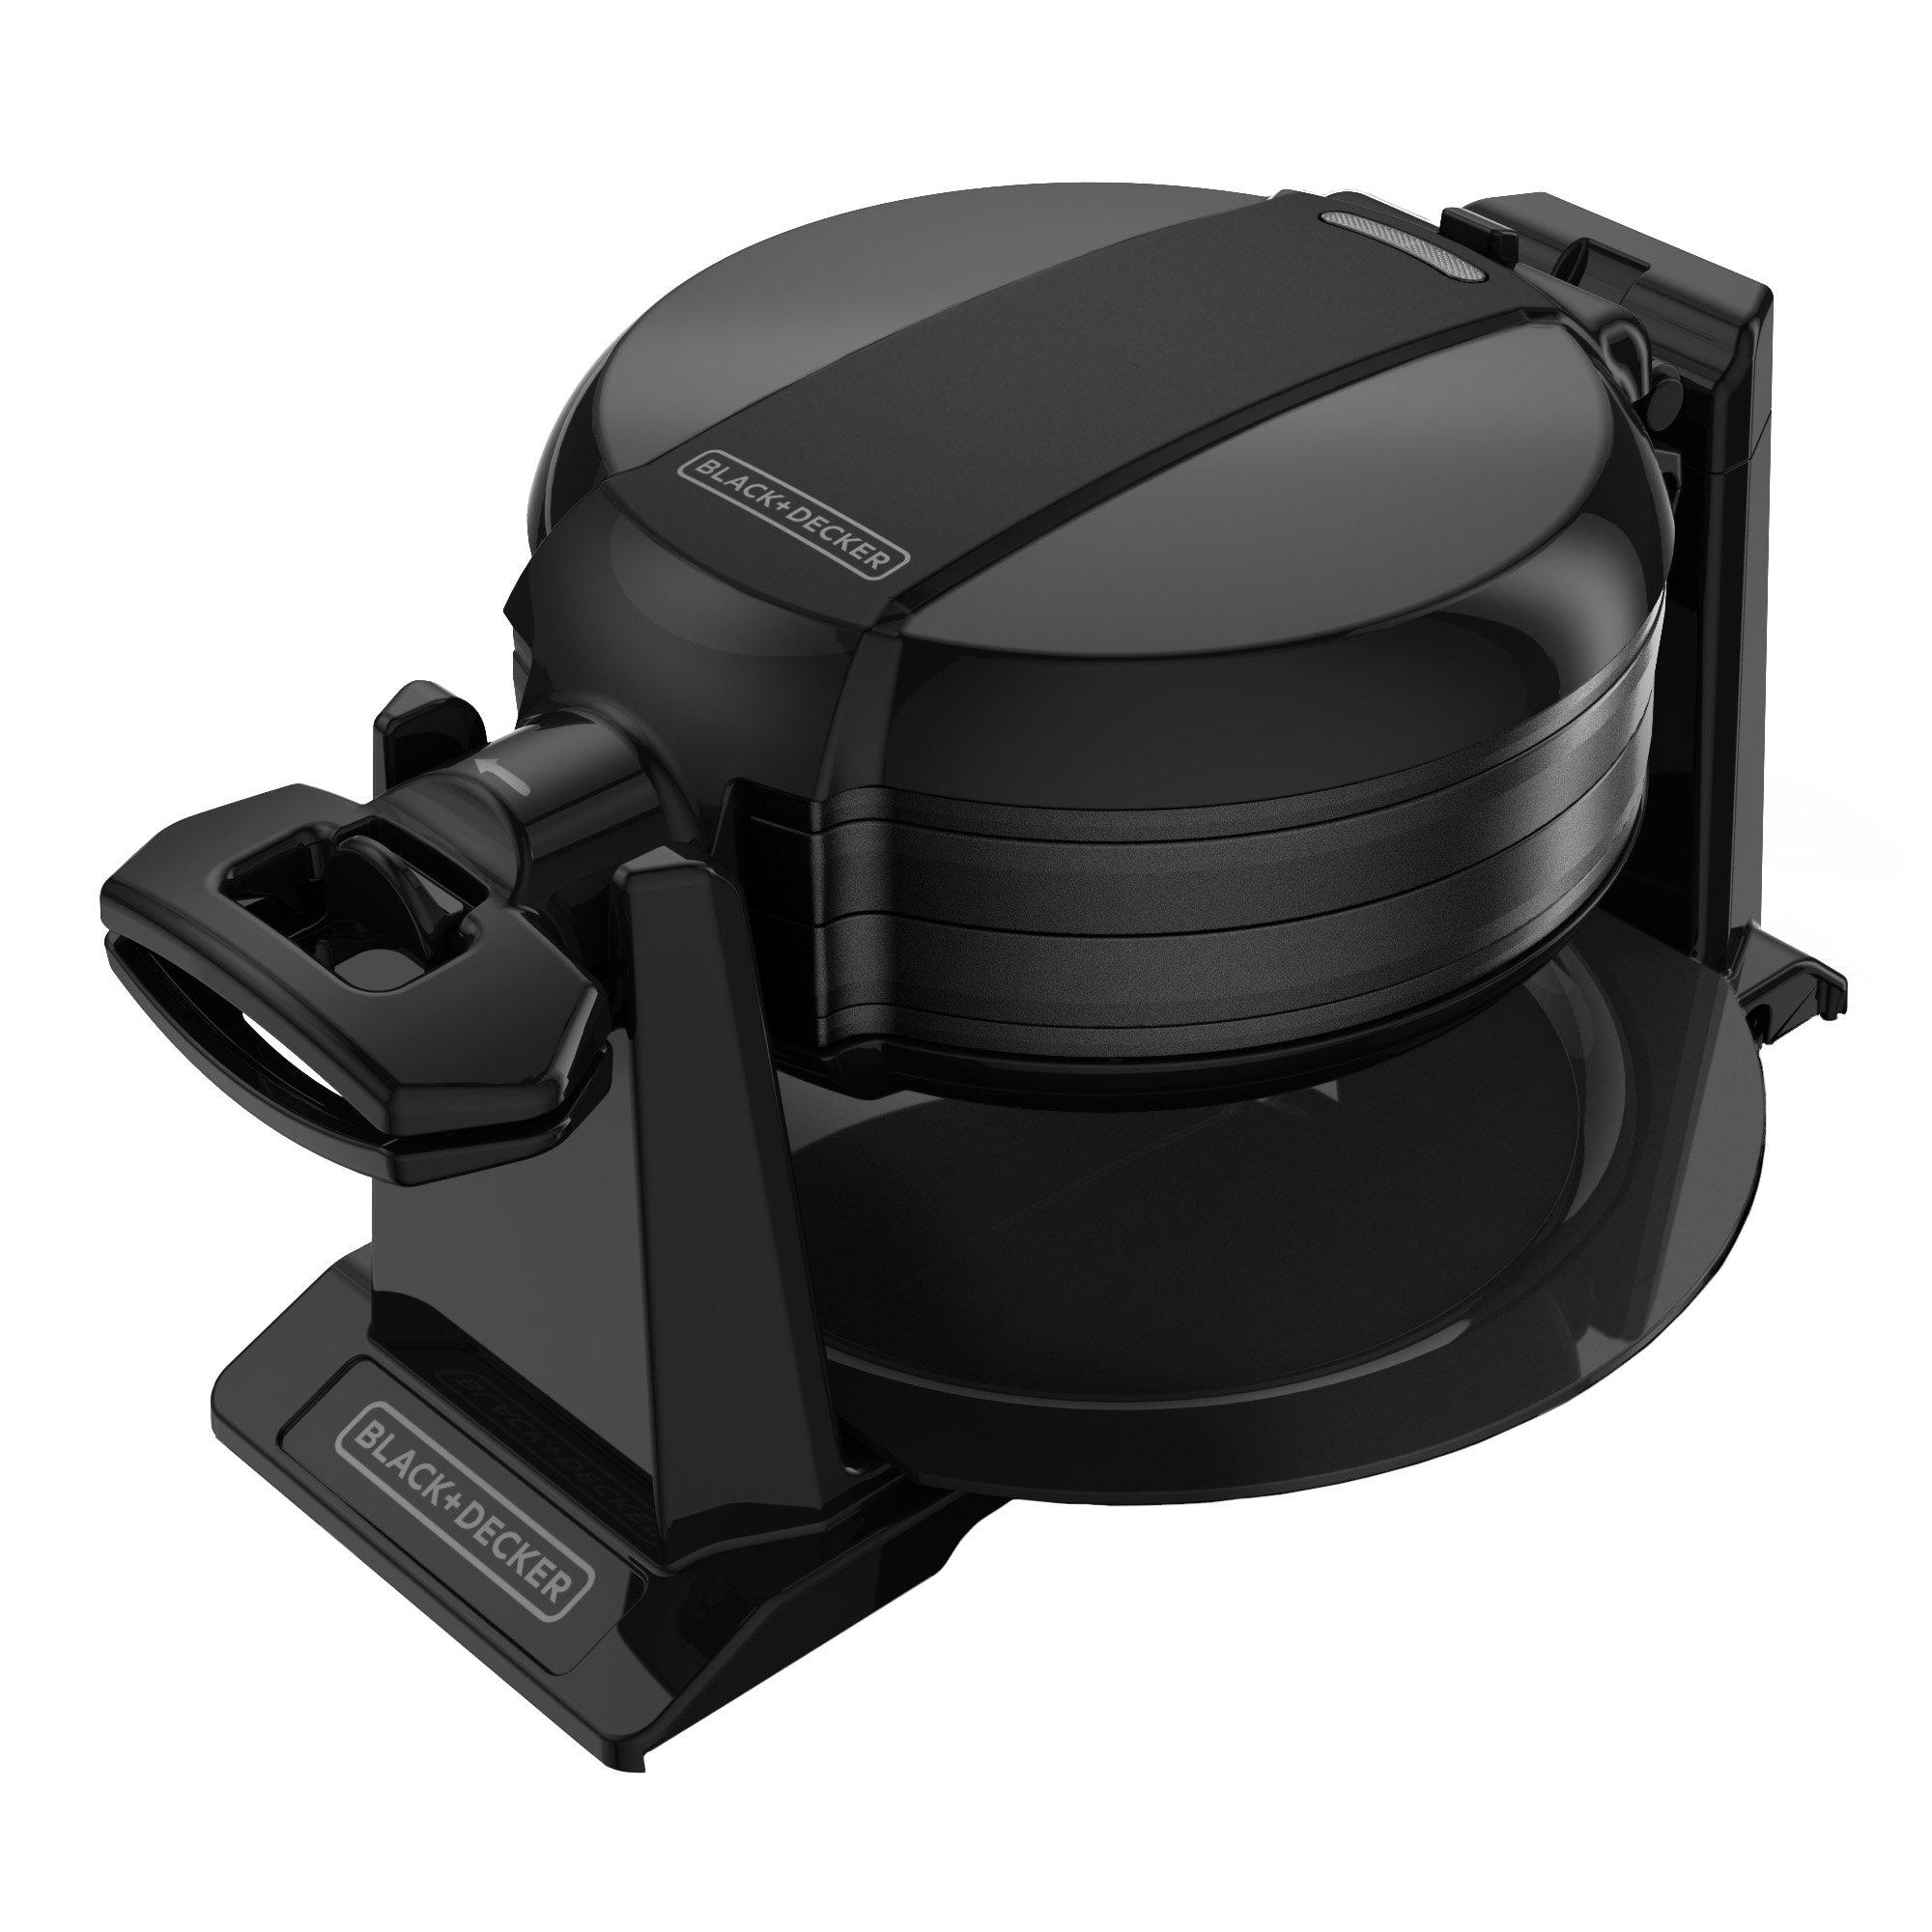 DECKER Rotating Waffle Black WMD200B